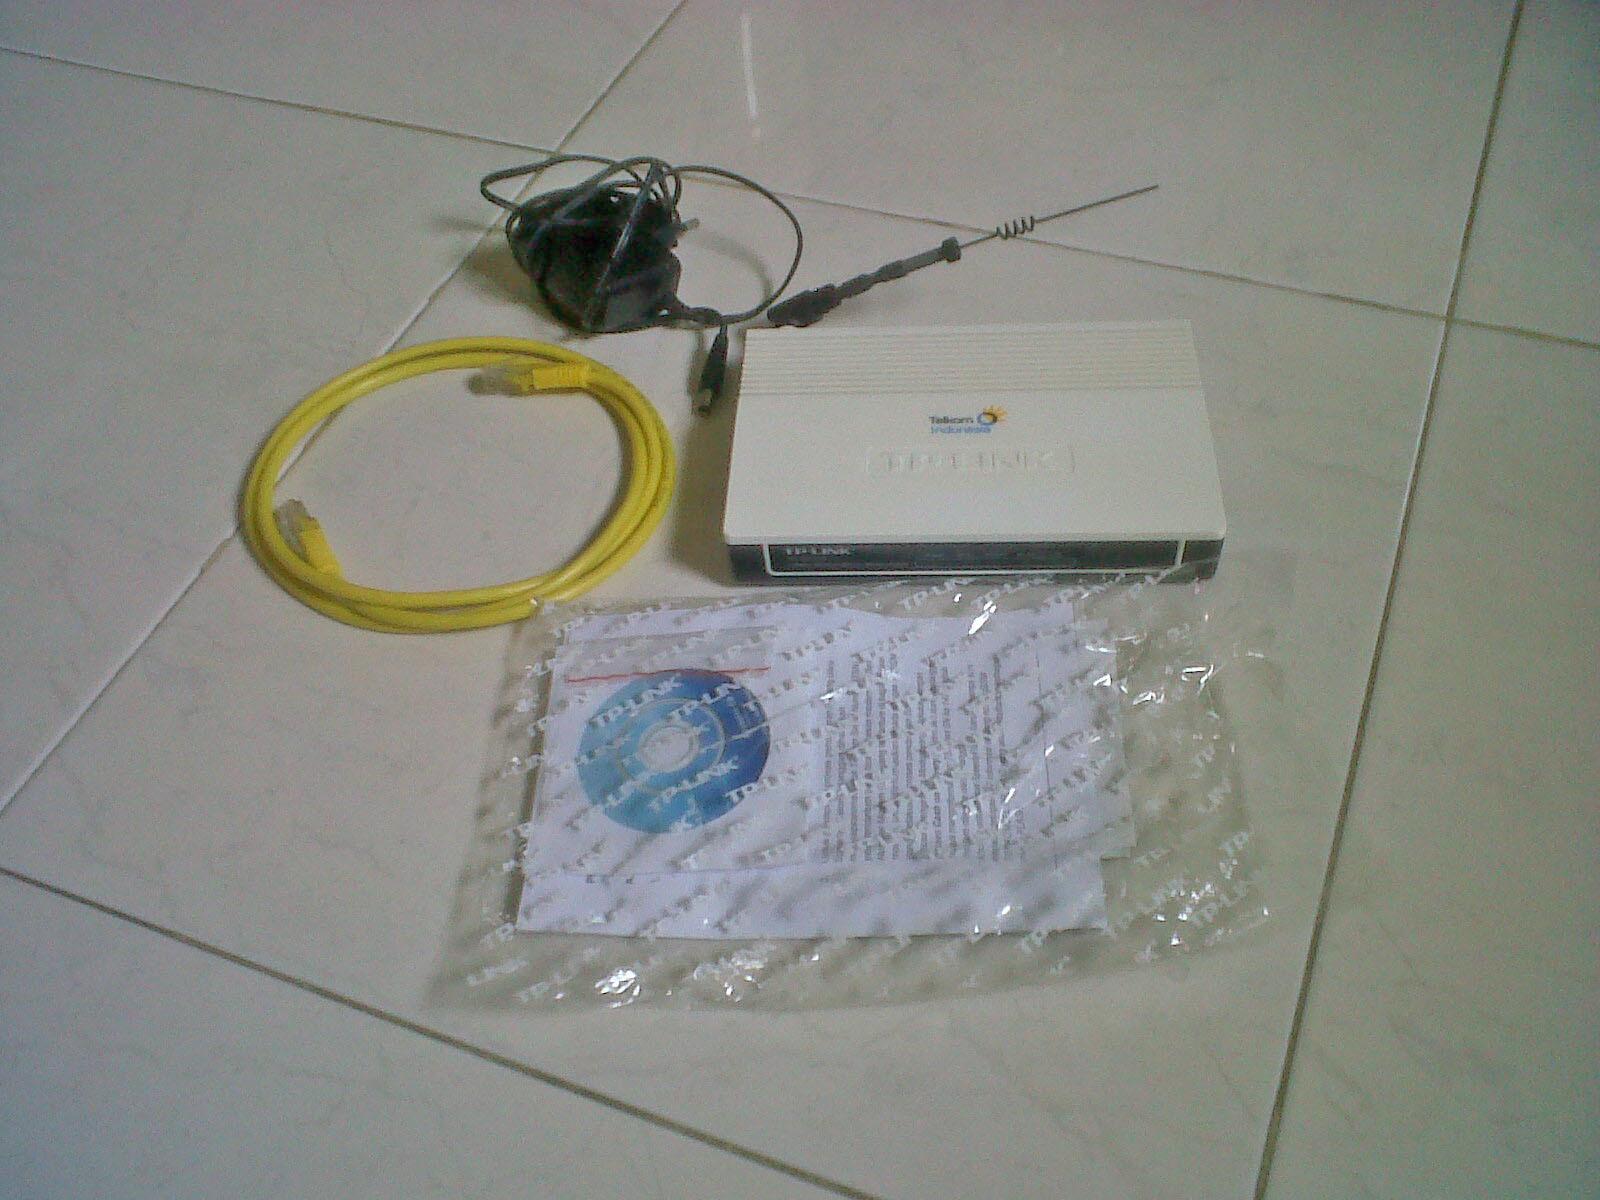 harga TP-LINK TD-W8101G (WIFI) Bekas Tokopedia.com